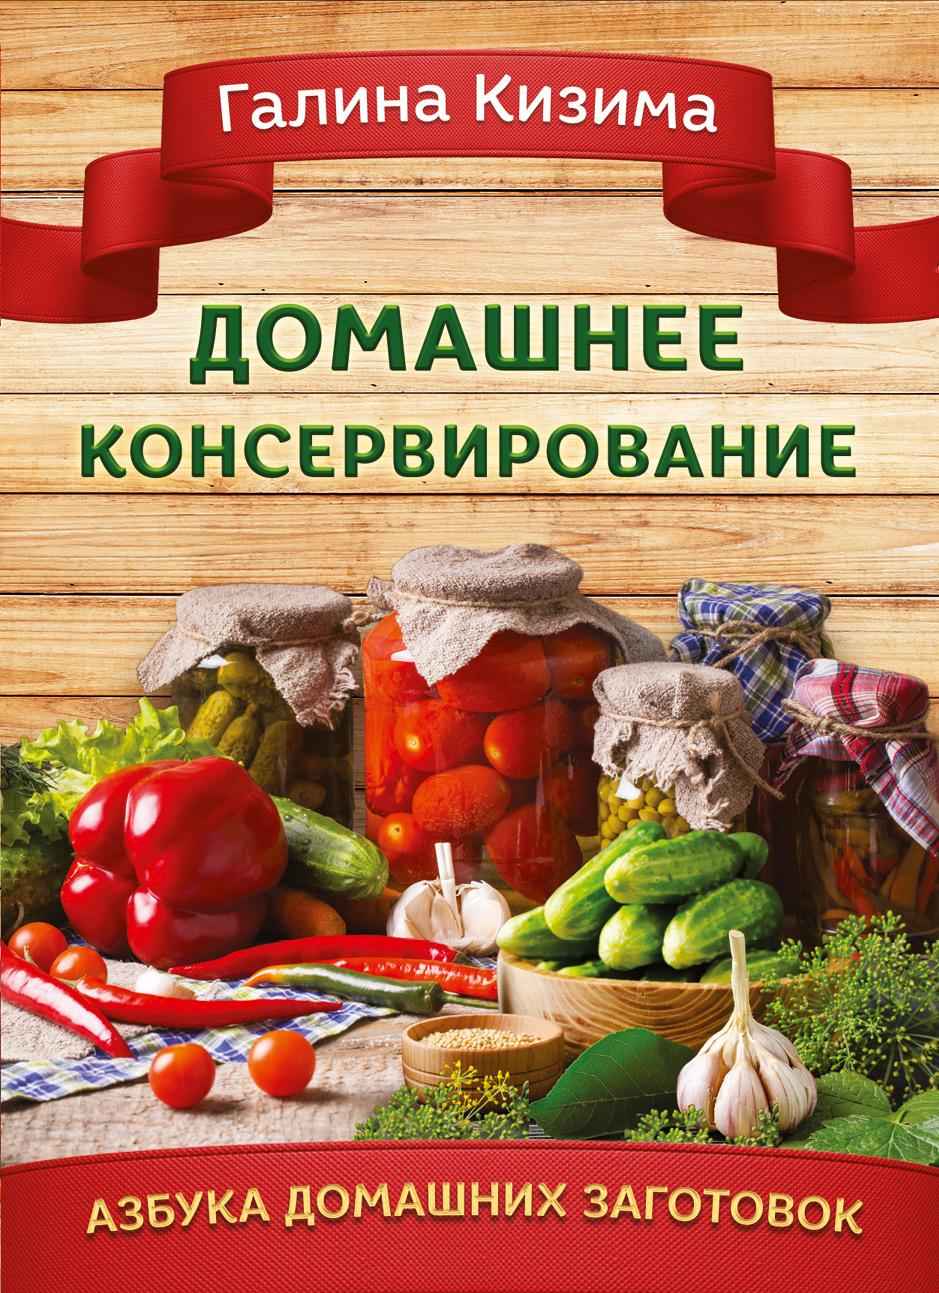 Галина Кизима Домашнее консервирование елена тверская консервирование для всех кому за… быстро вкусно надежно